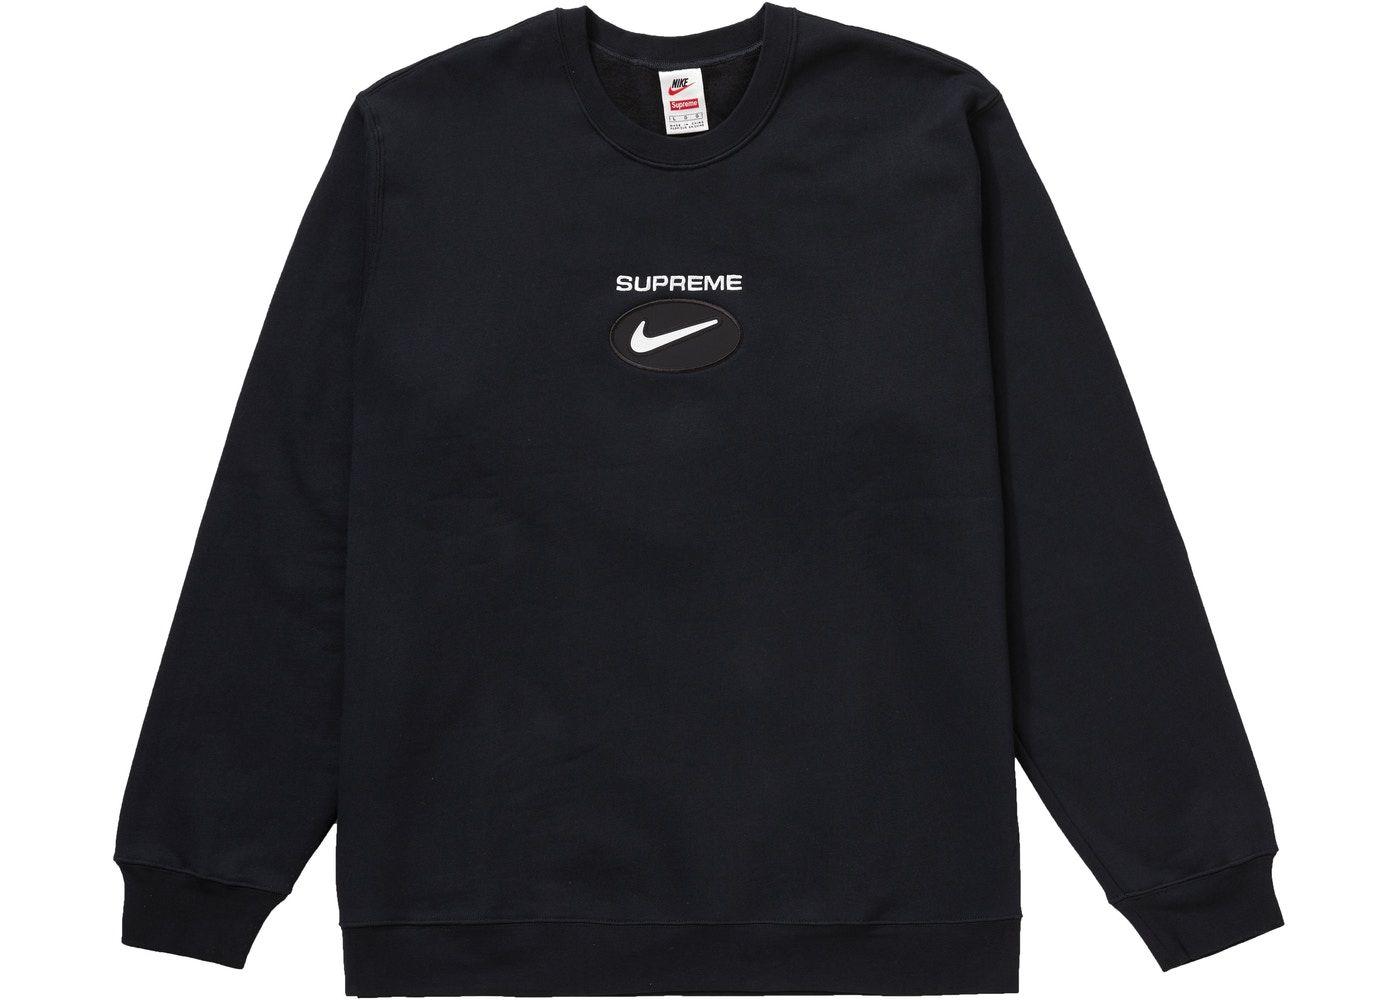 Supreme Nike Jewel Crewneck Black In 2021 Supreme Clothing Designer Clothes For Men Nike [ 1000 x 1400 Pixel ]